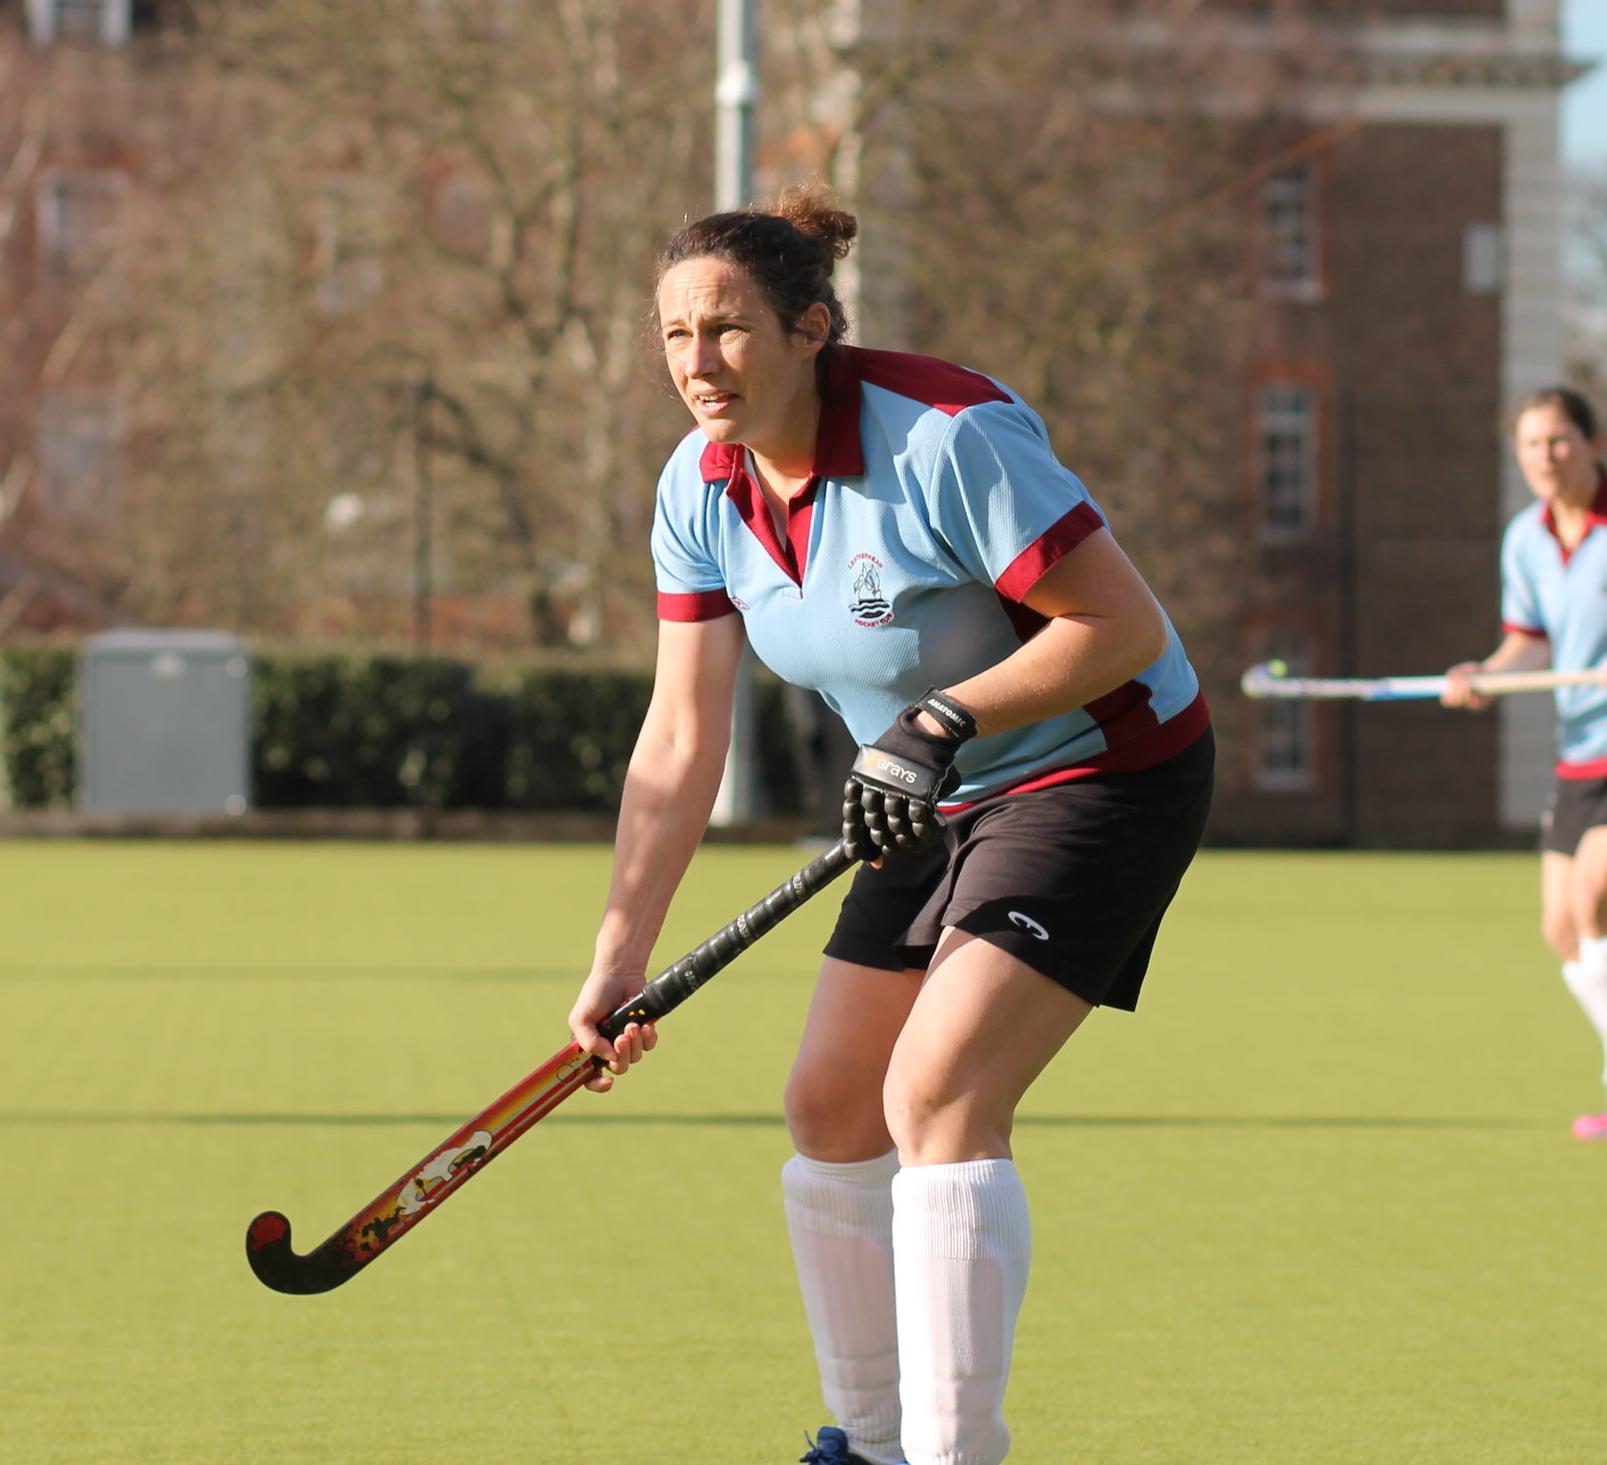 Megan Smith - Club Secretary  Stick of Choice: